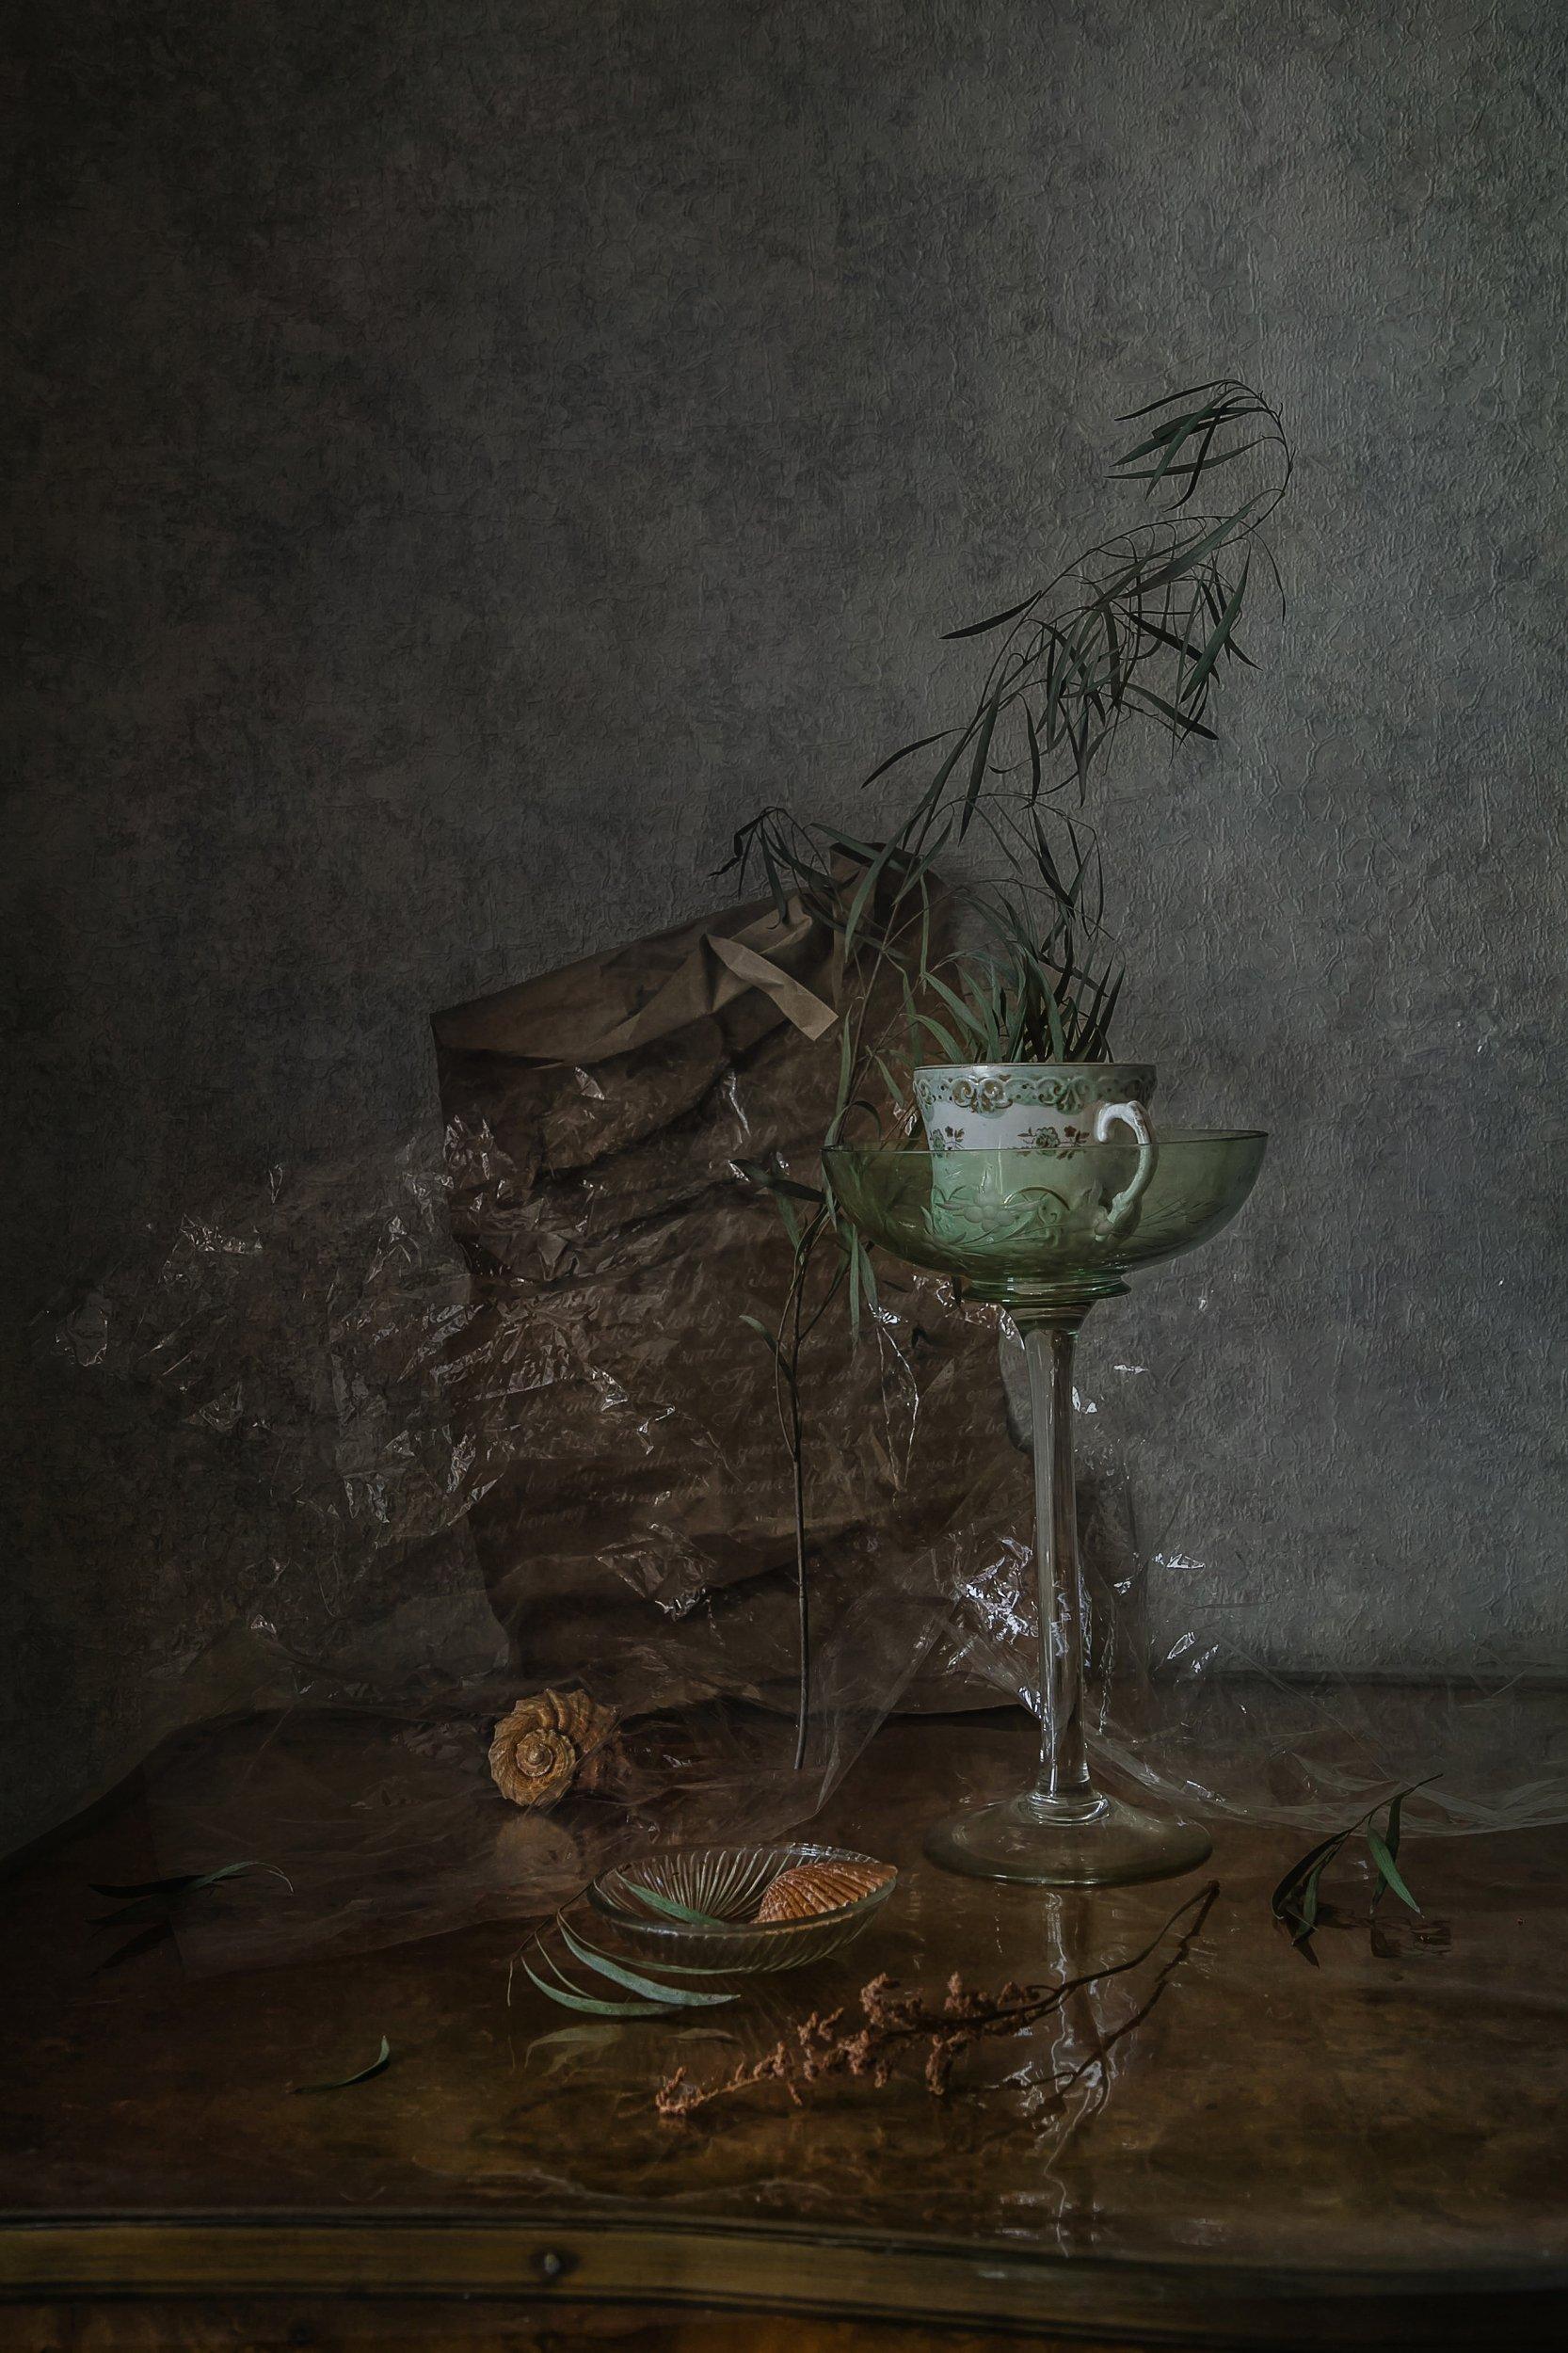 натюрморт, стекло, фарфор, ракушки, Анна Петина